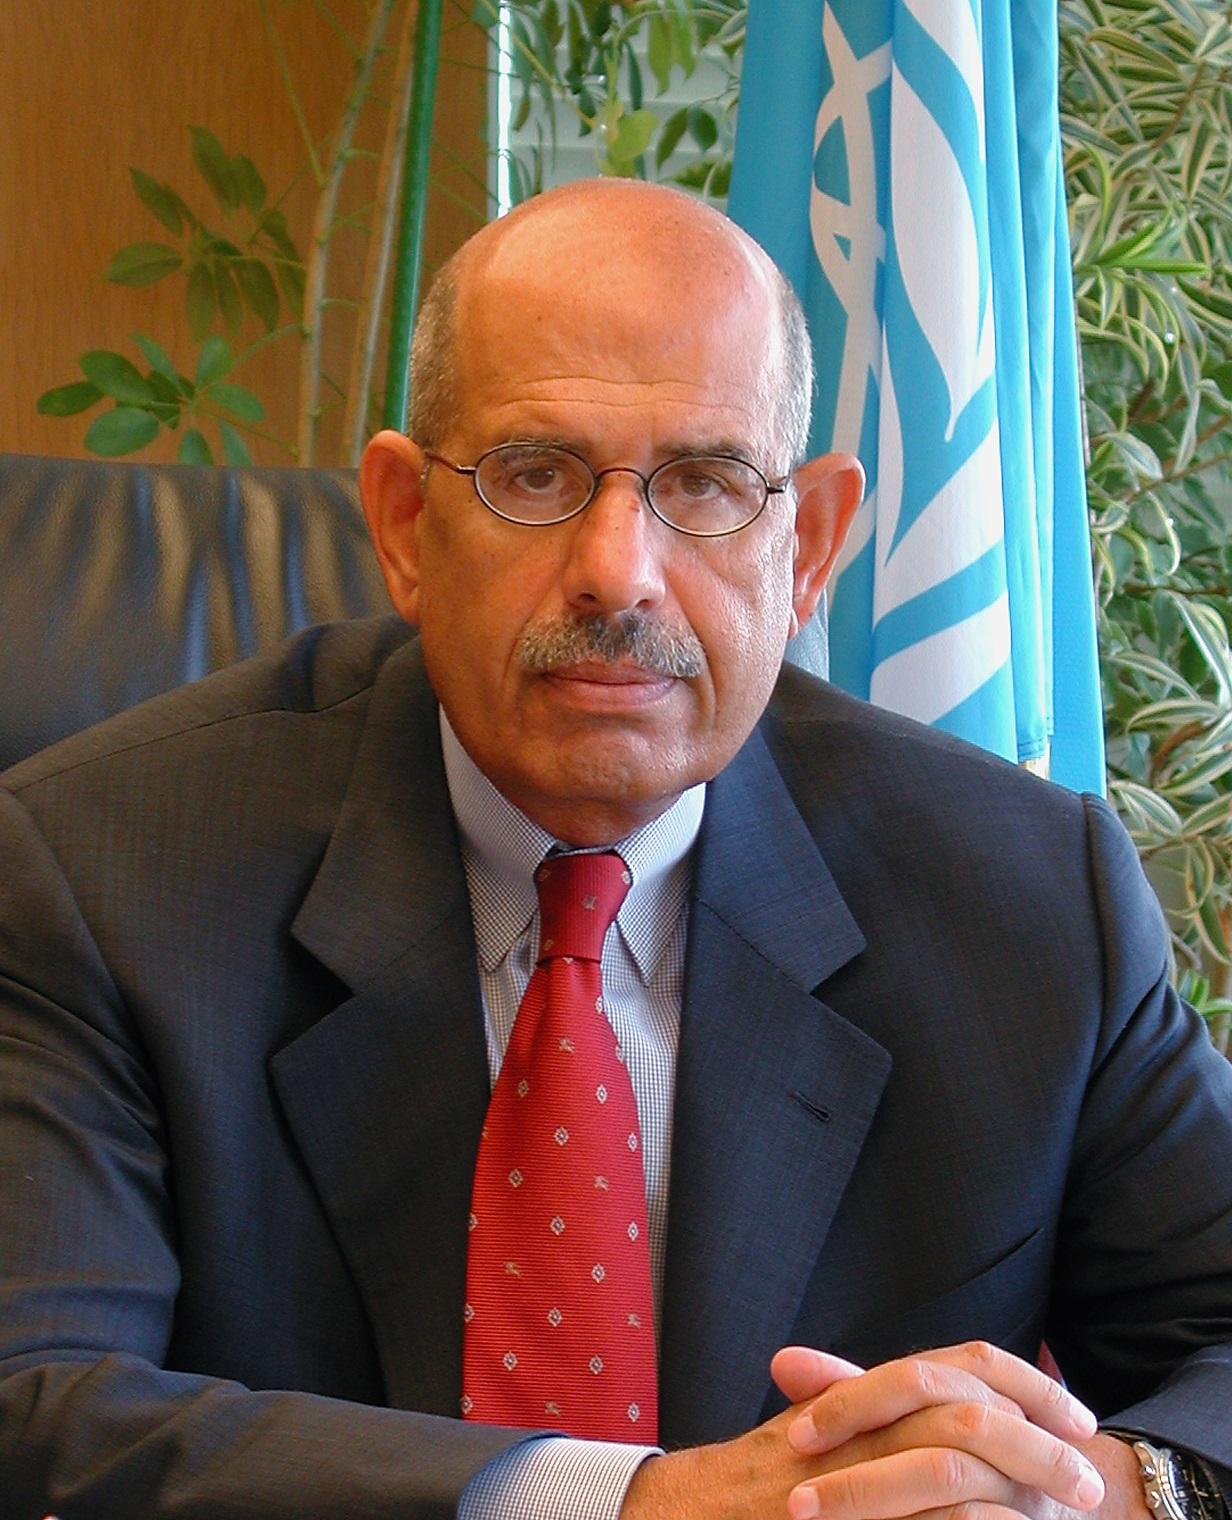 [Mohamed ElBarradei, image from the IAEA through Wikipedia]